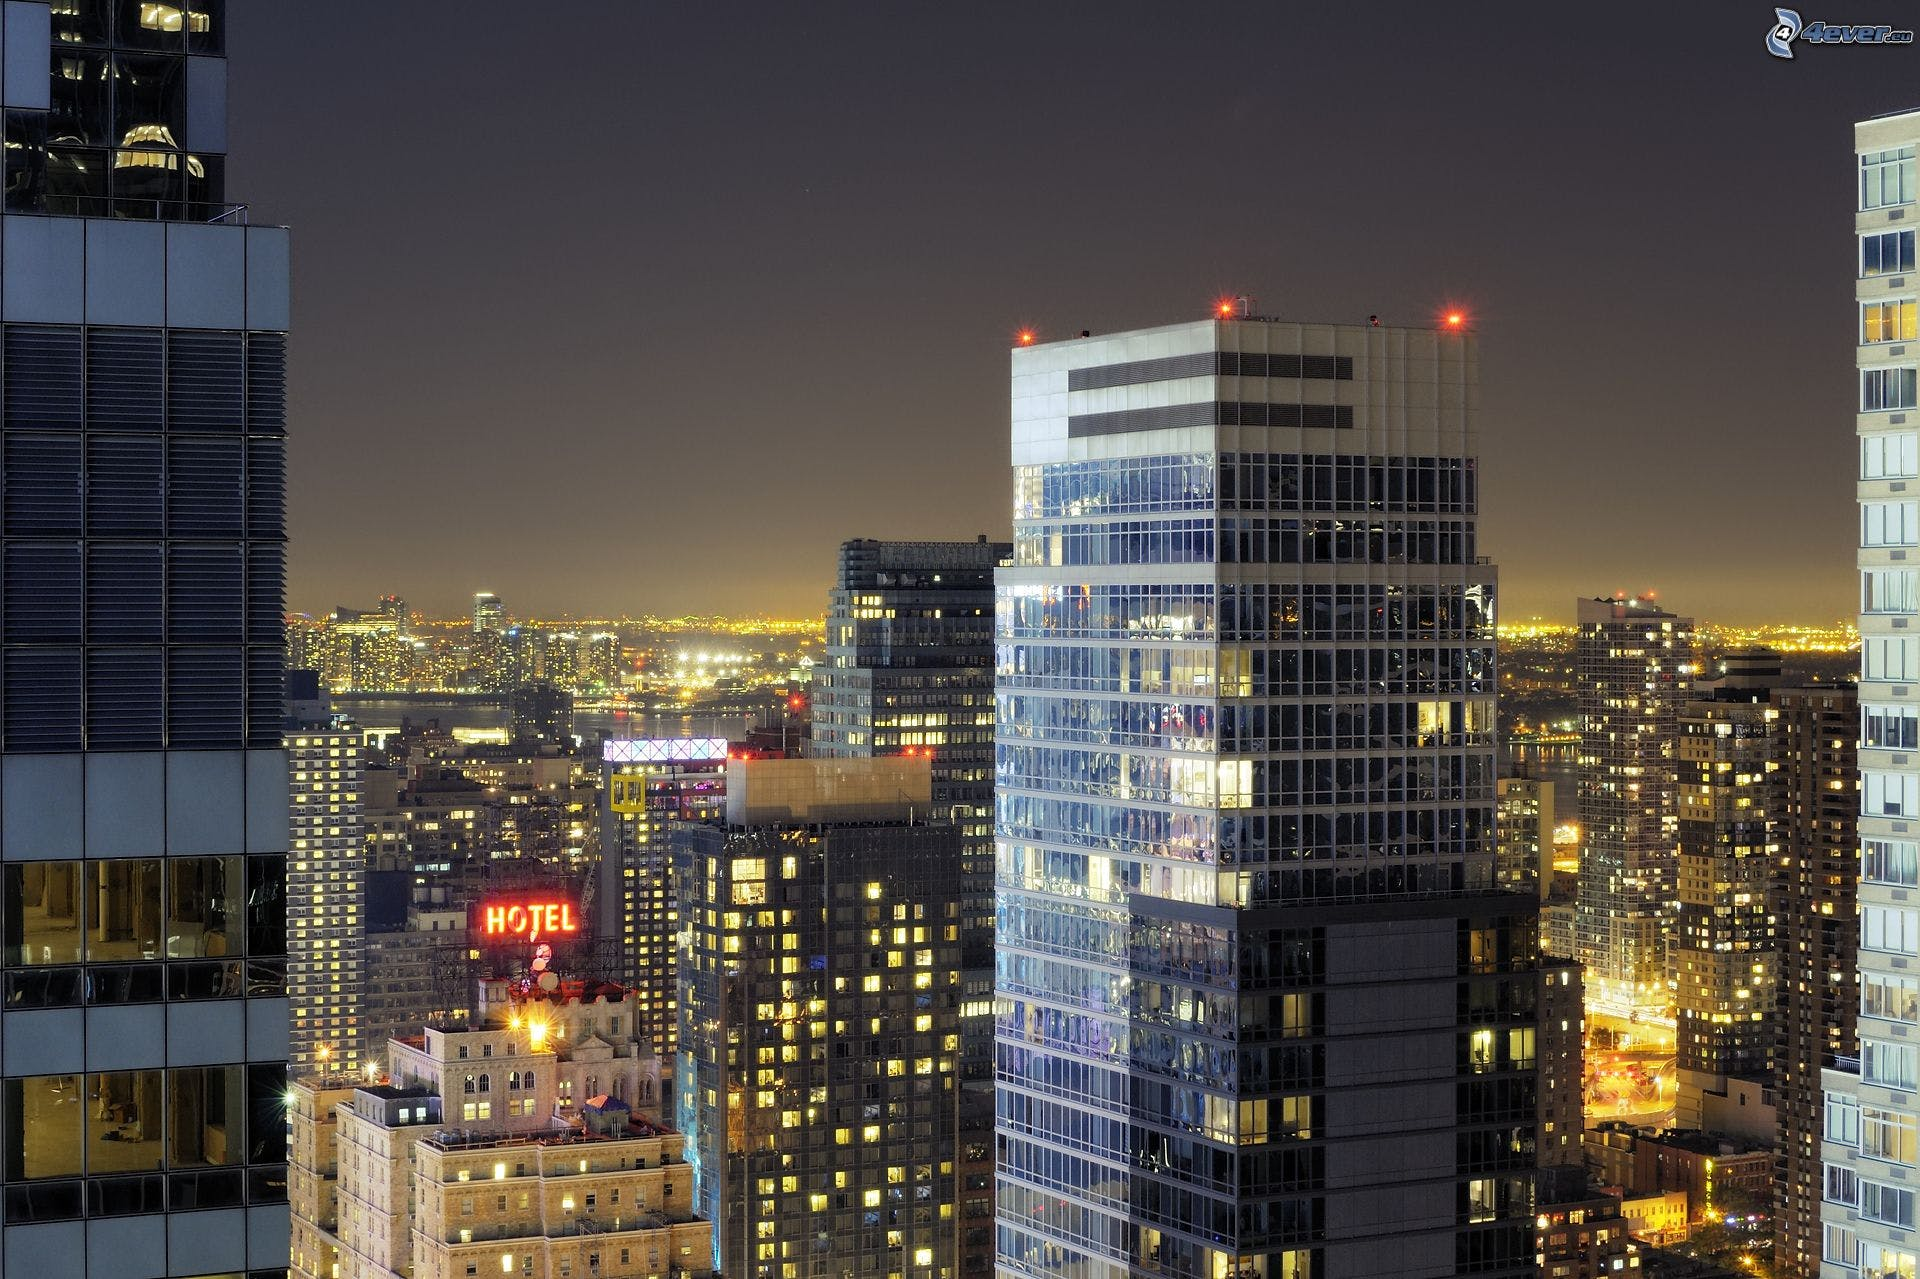 Free stock photo of skyscrapers